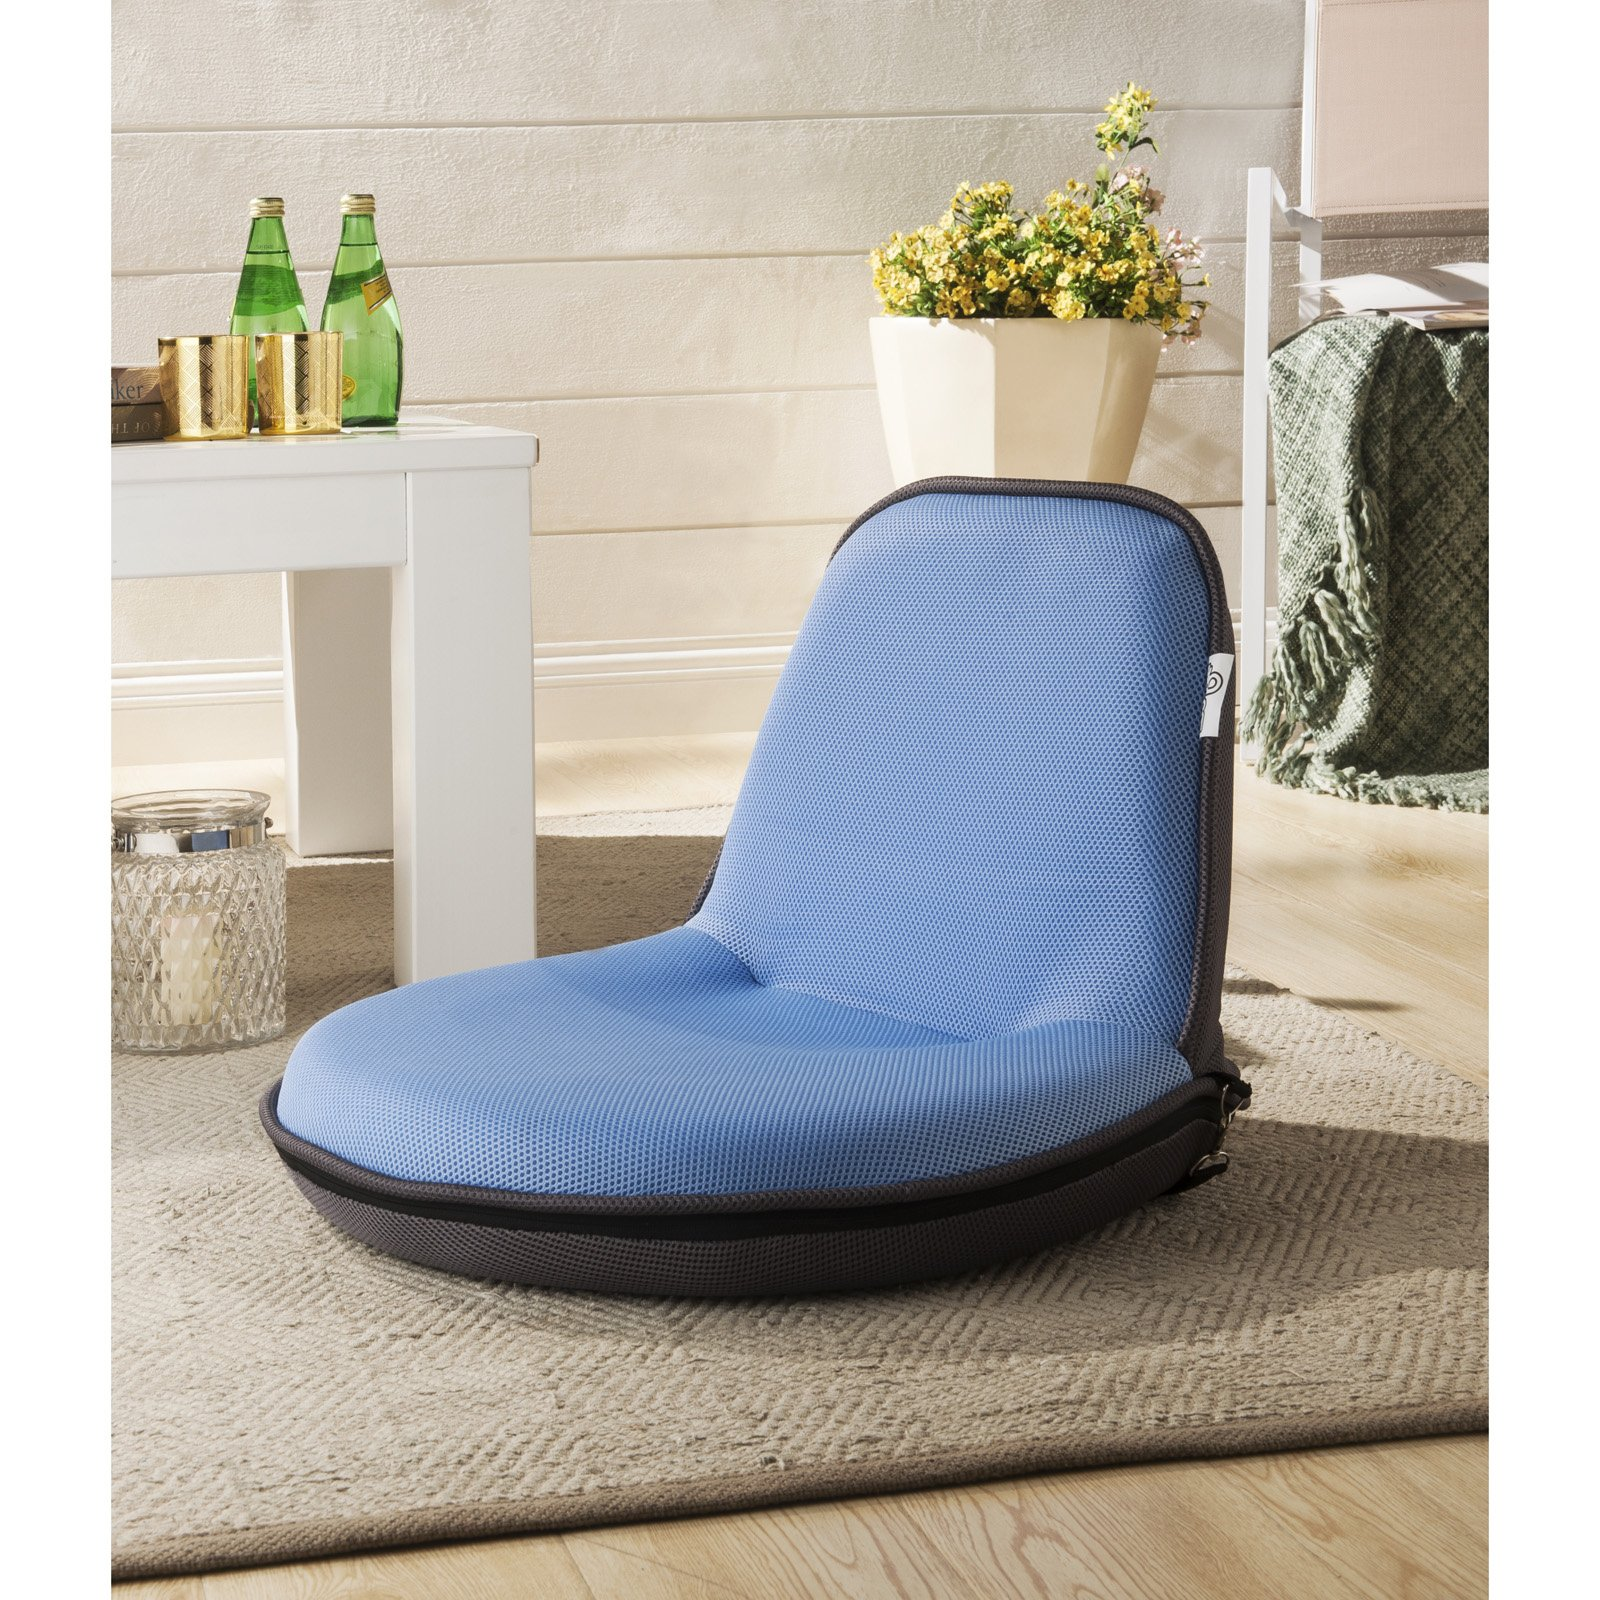 Loungie Quickchair Indoor/Outdoor Portable Mesh Camping Floor Chair